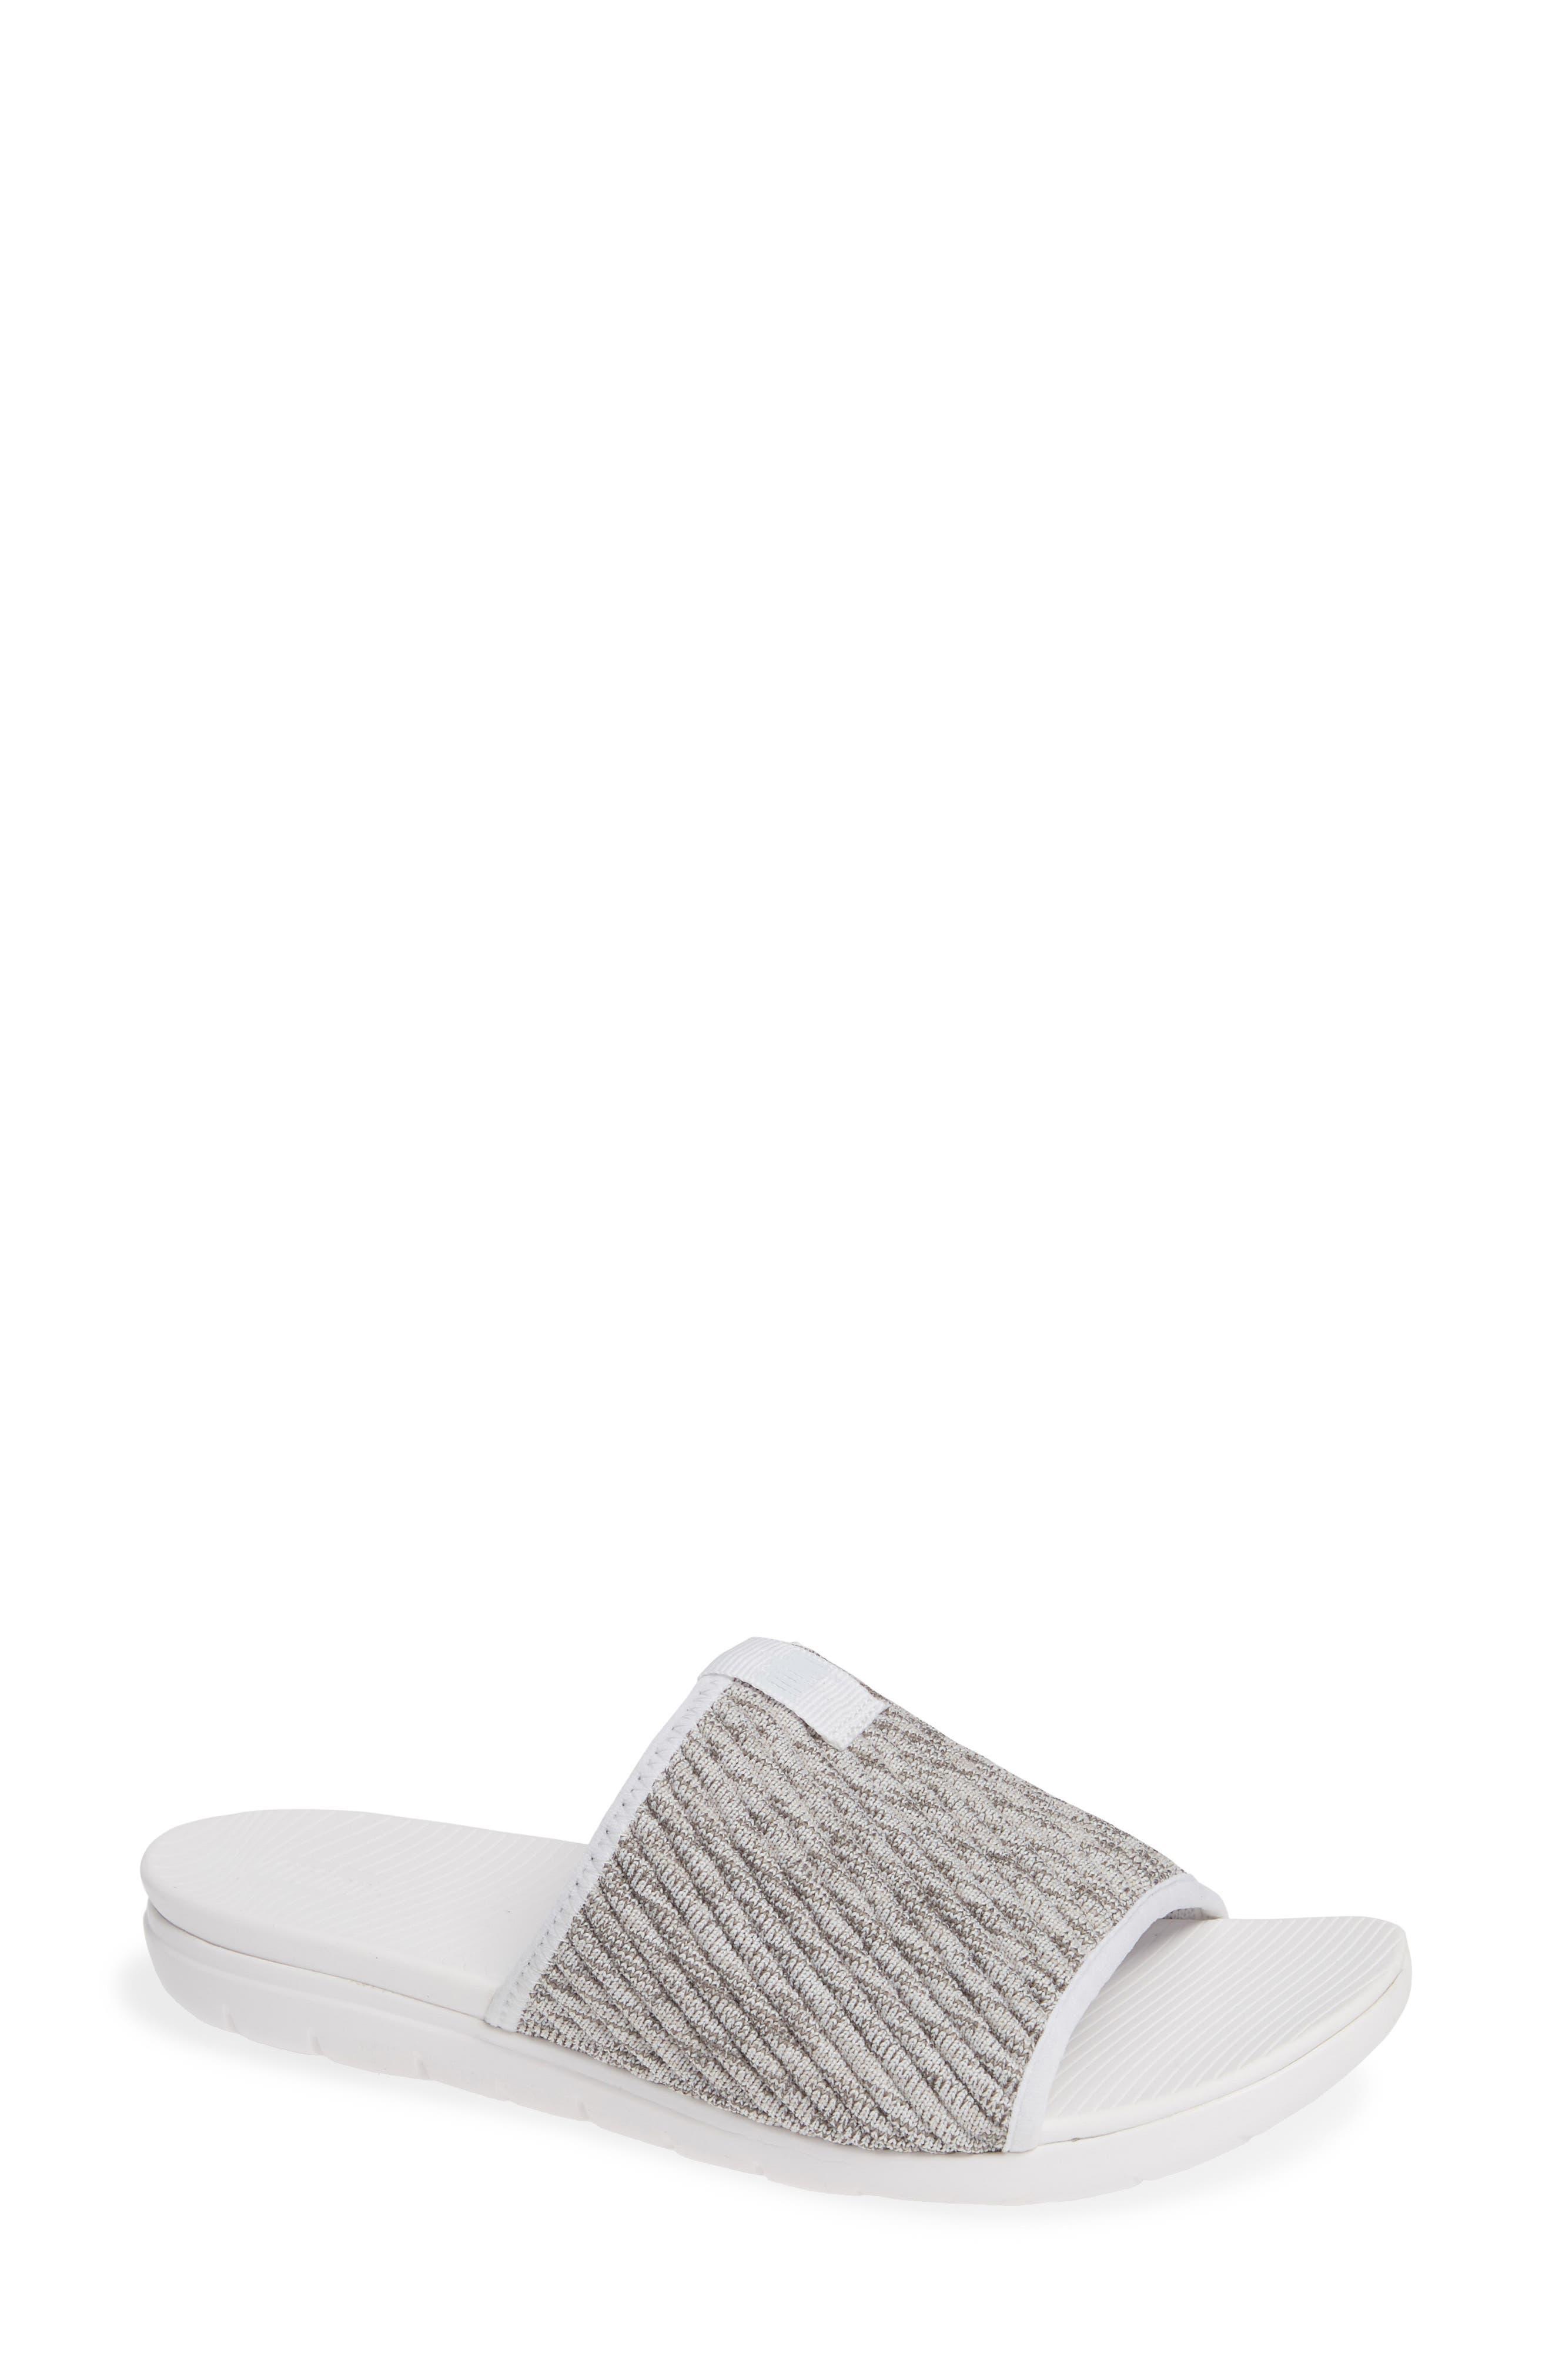 Fitflop Artknit Slide Sandal, White